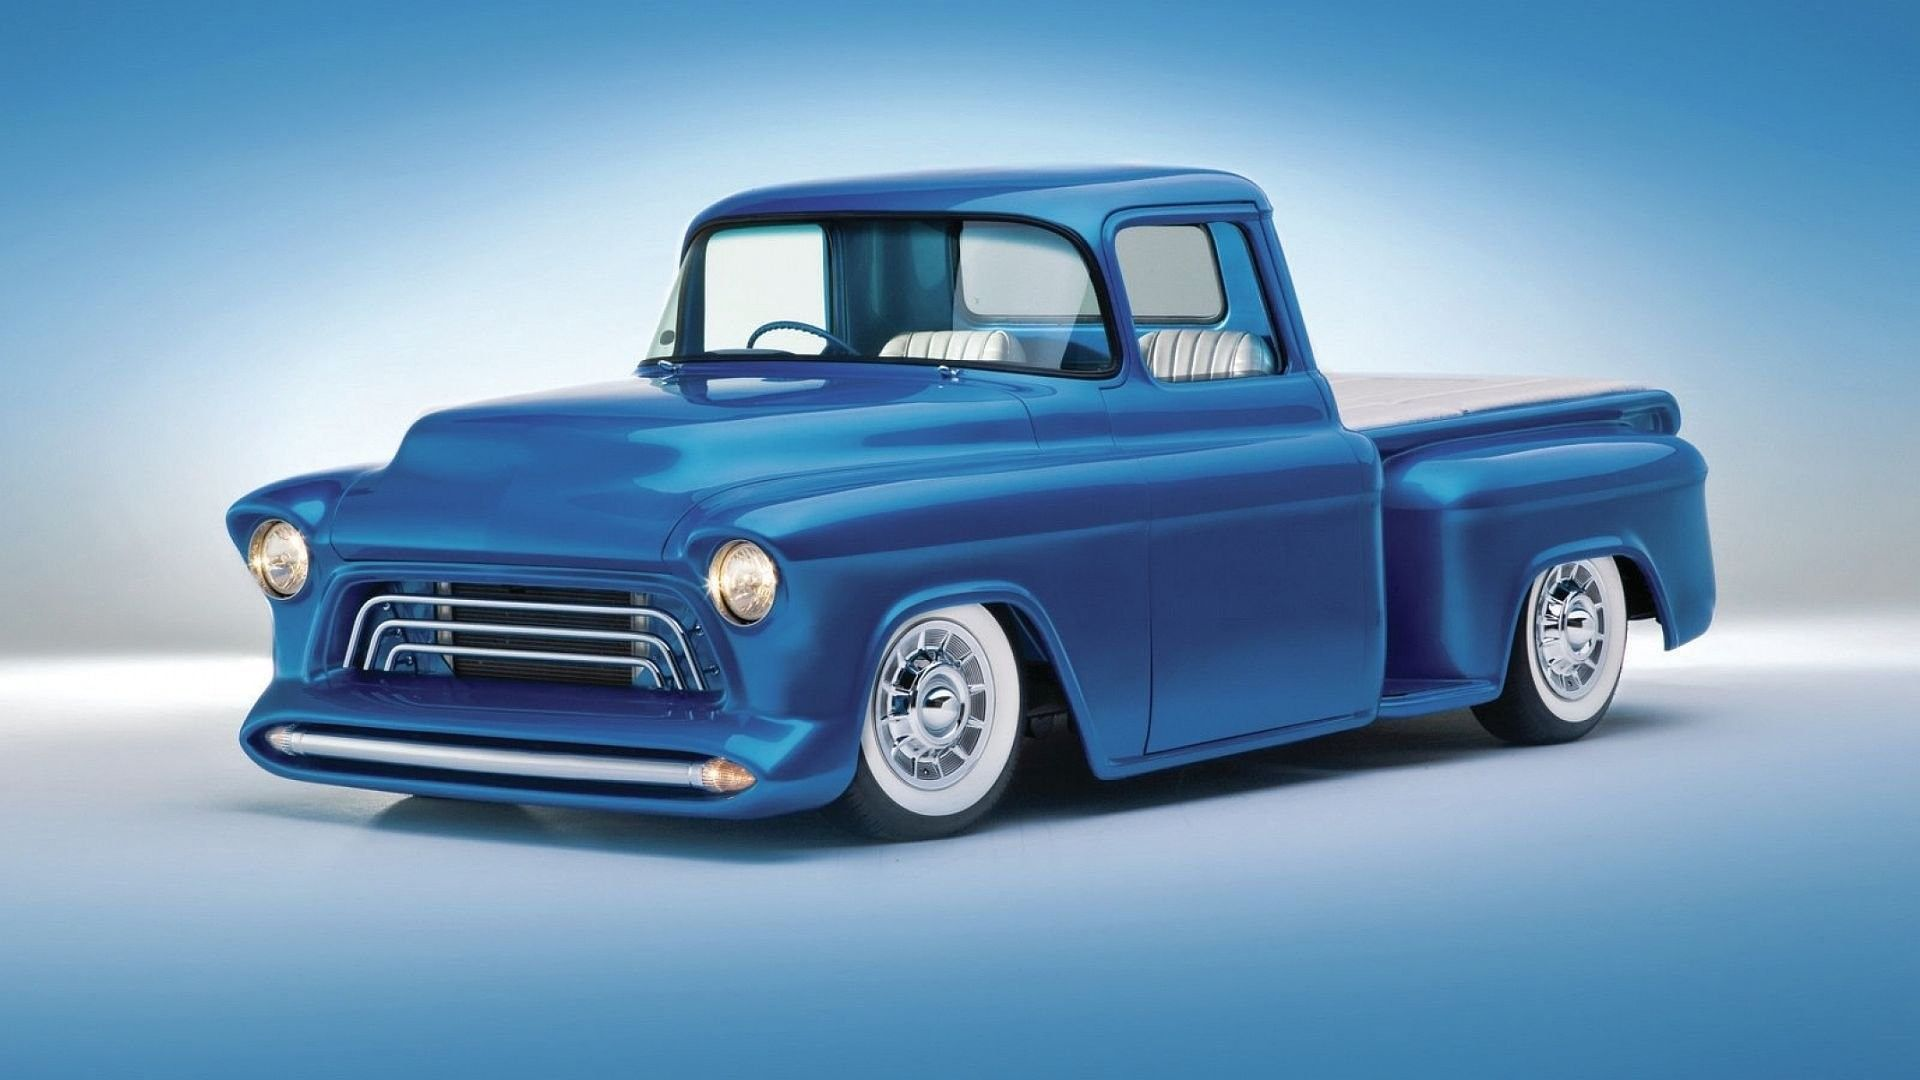 Pin By Jay On 1955 Chevy Pickup 1955 Chevrolet Truck Chevrolet Trucks 55 Chevy Truck